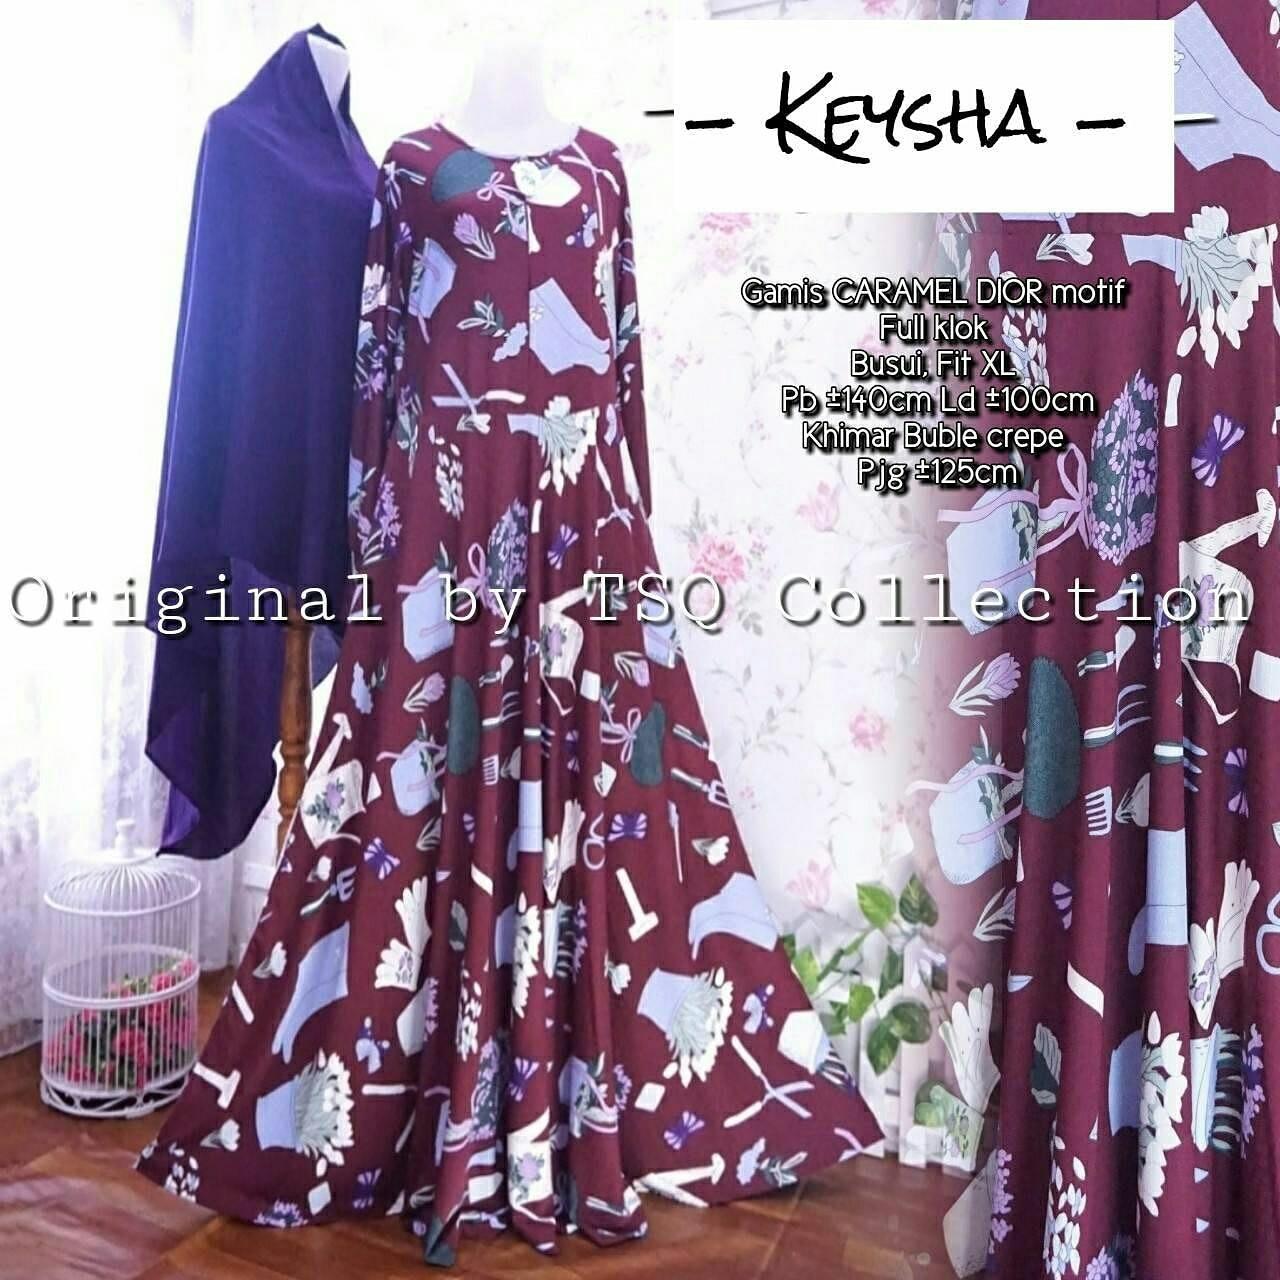 Jual baju muslim remaja keysha syari  baju muslim terbaru - Kota